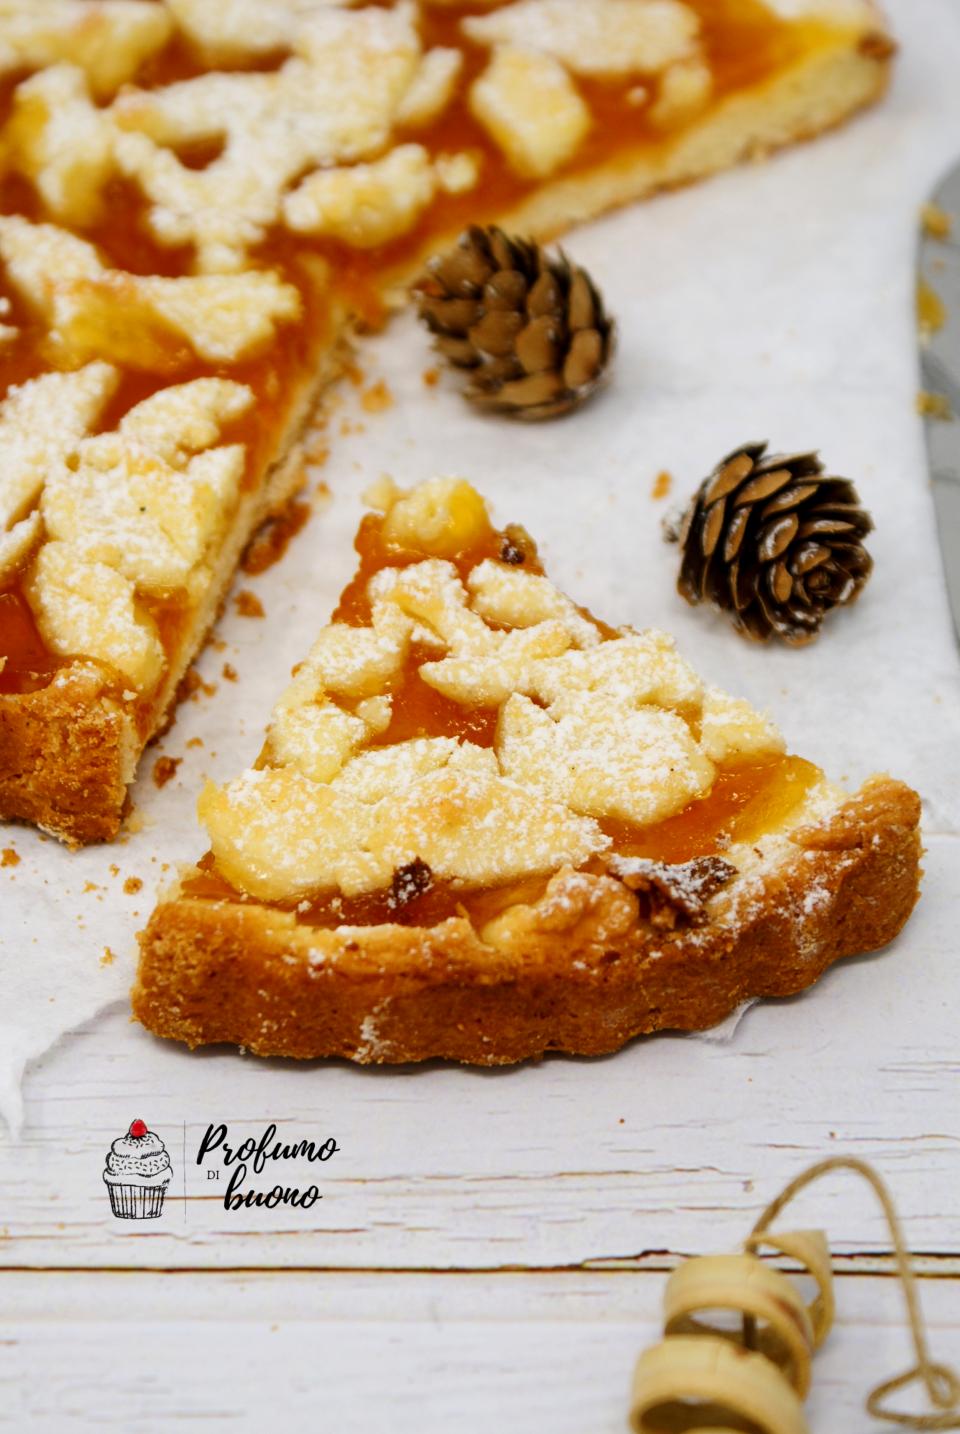 Gluten and dairy free crostata